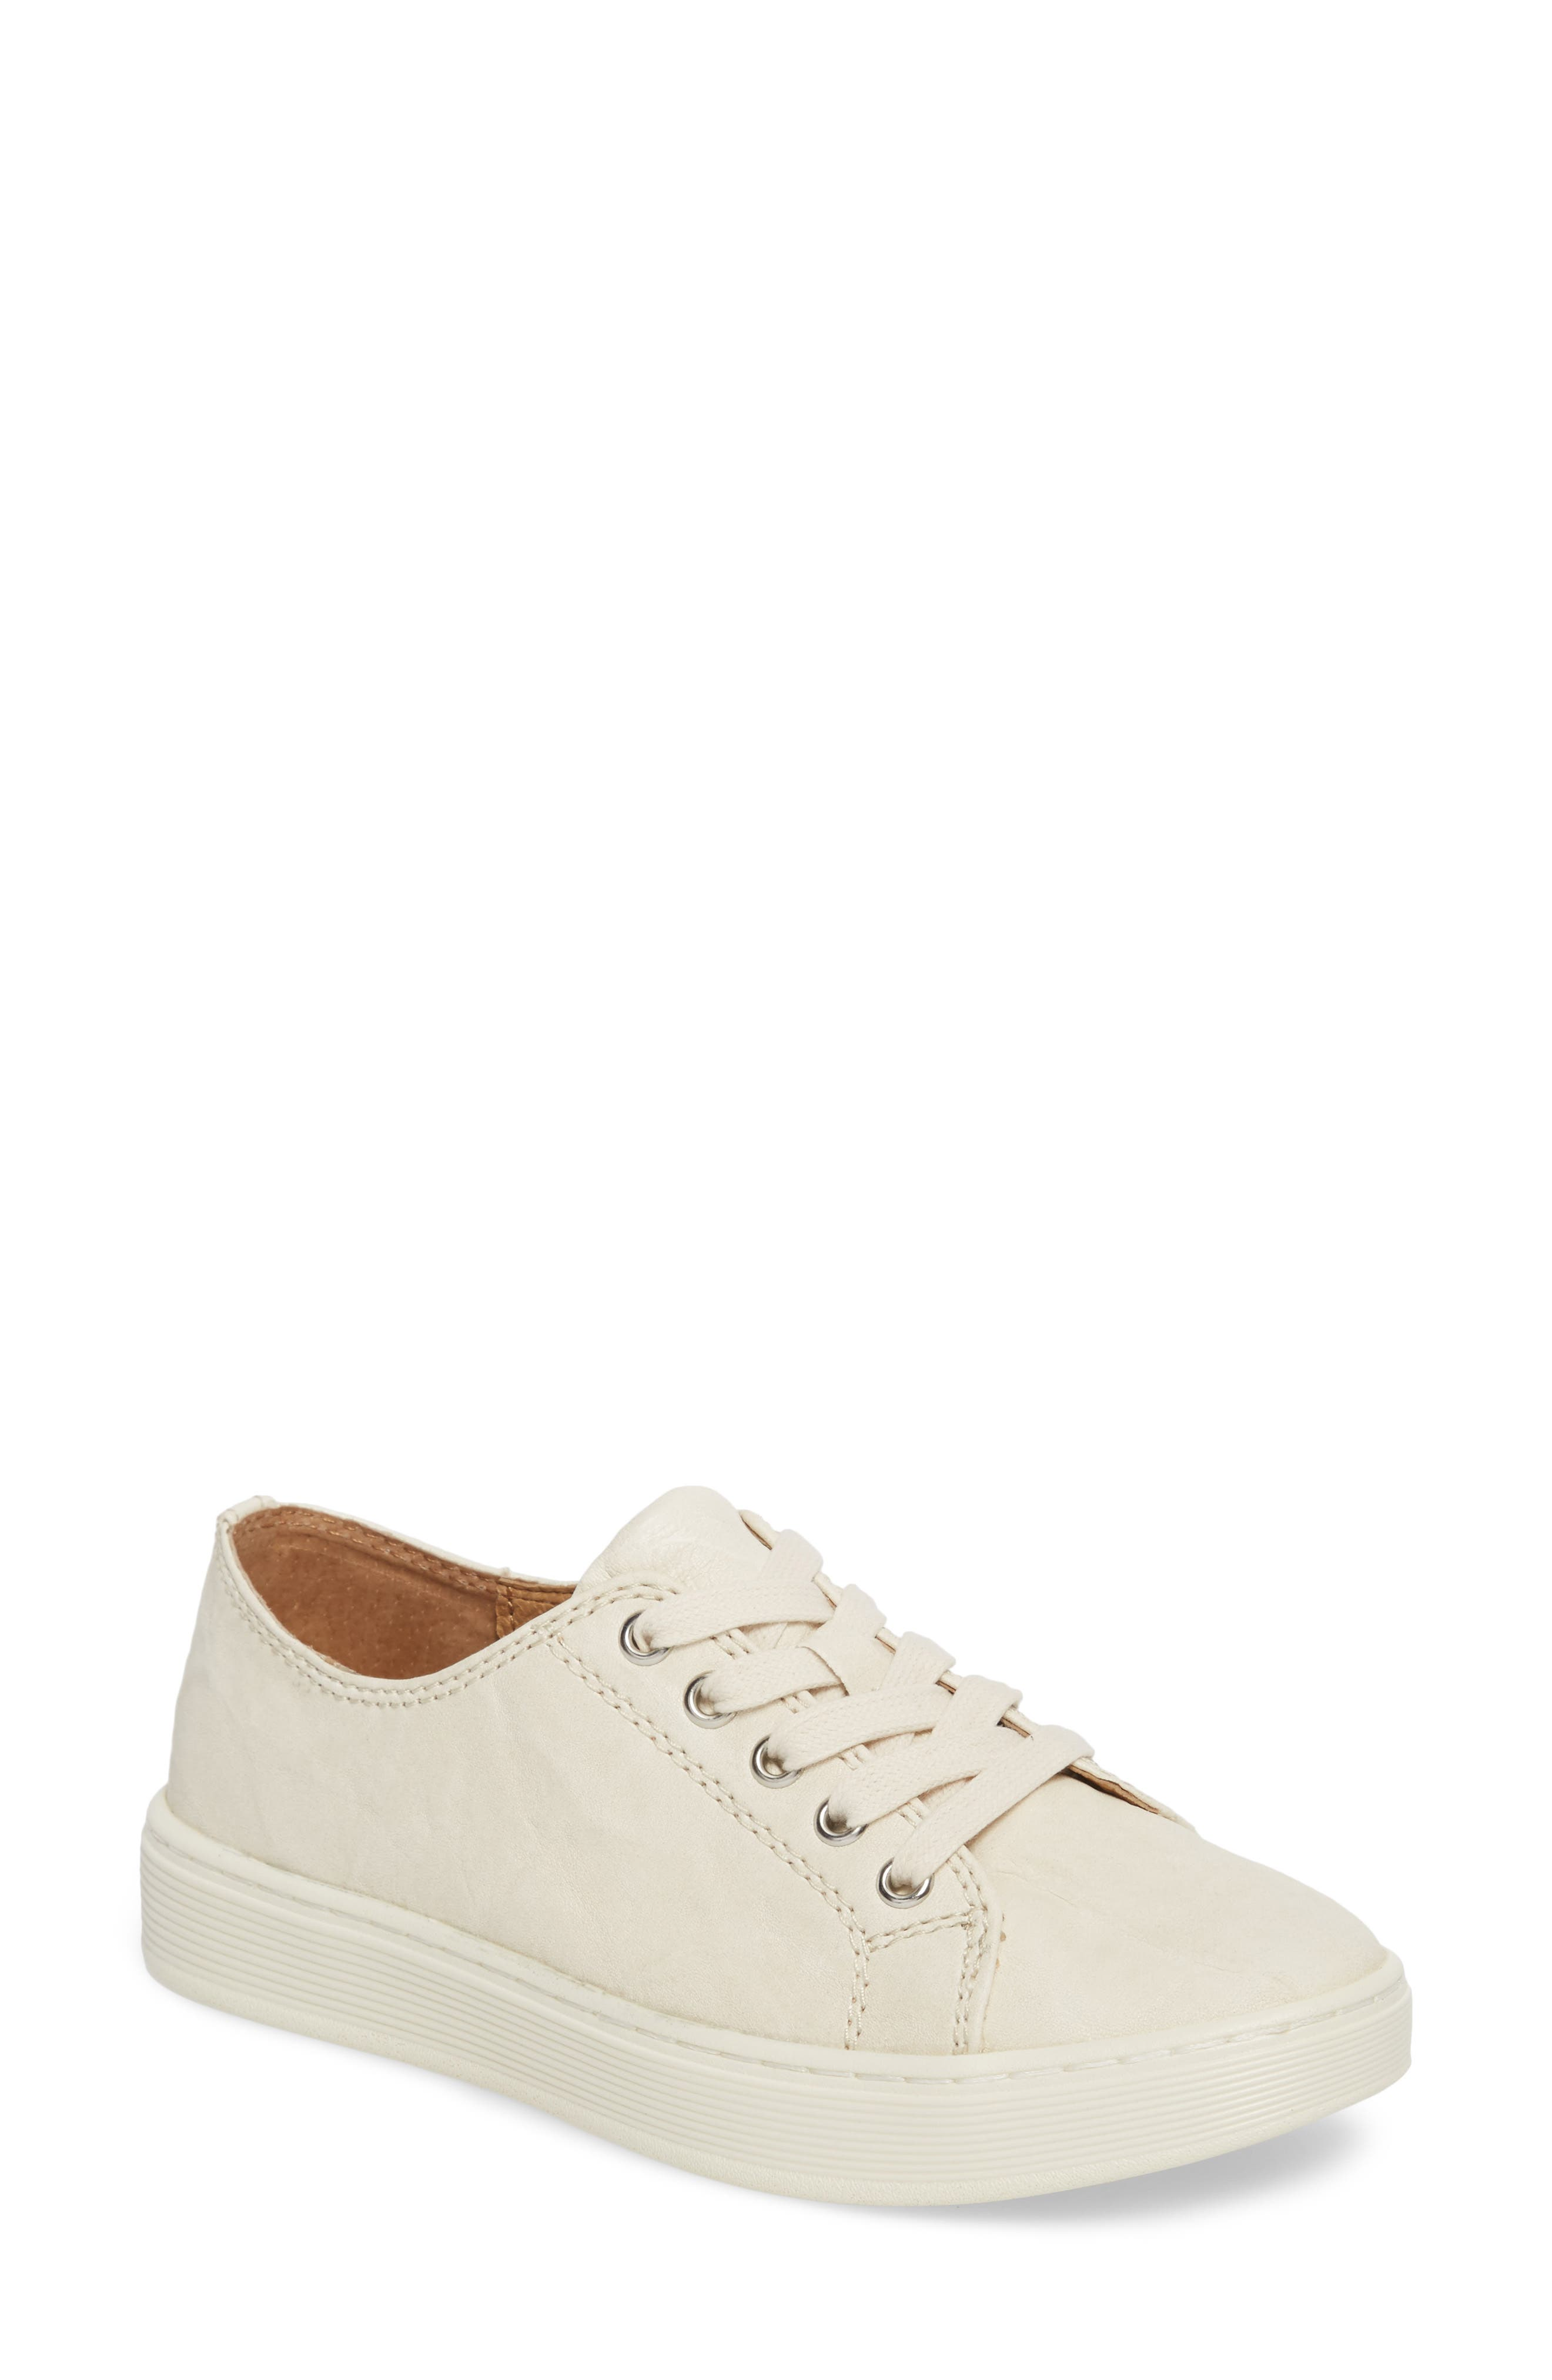 Baltazar Sneaker,                             Main thumbnail 1, color,                             Latte Leather